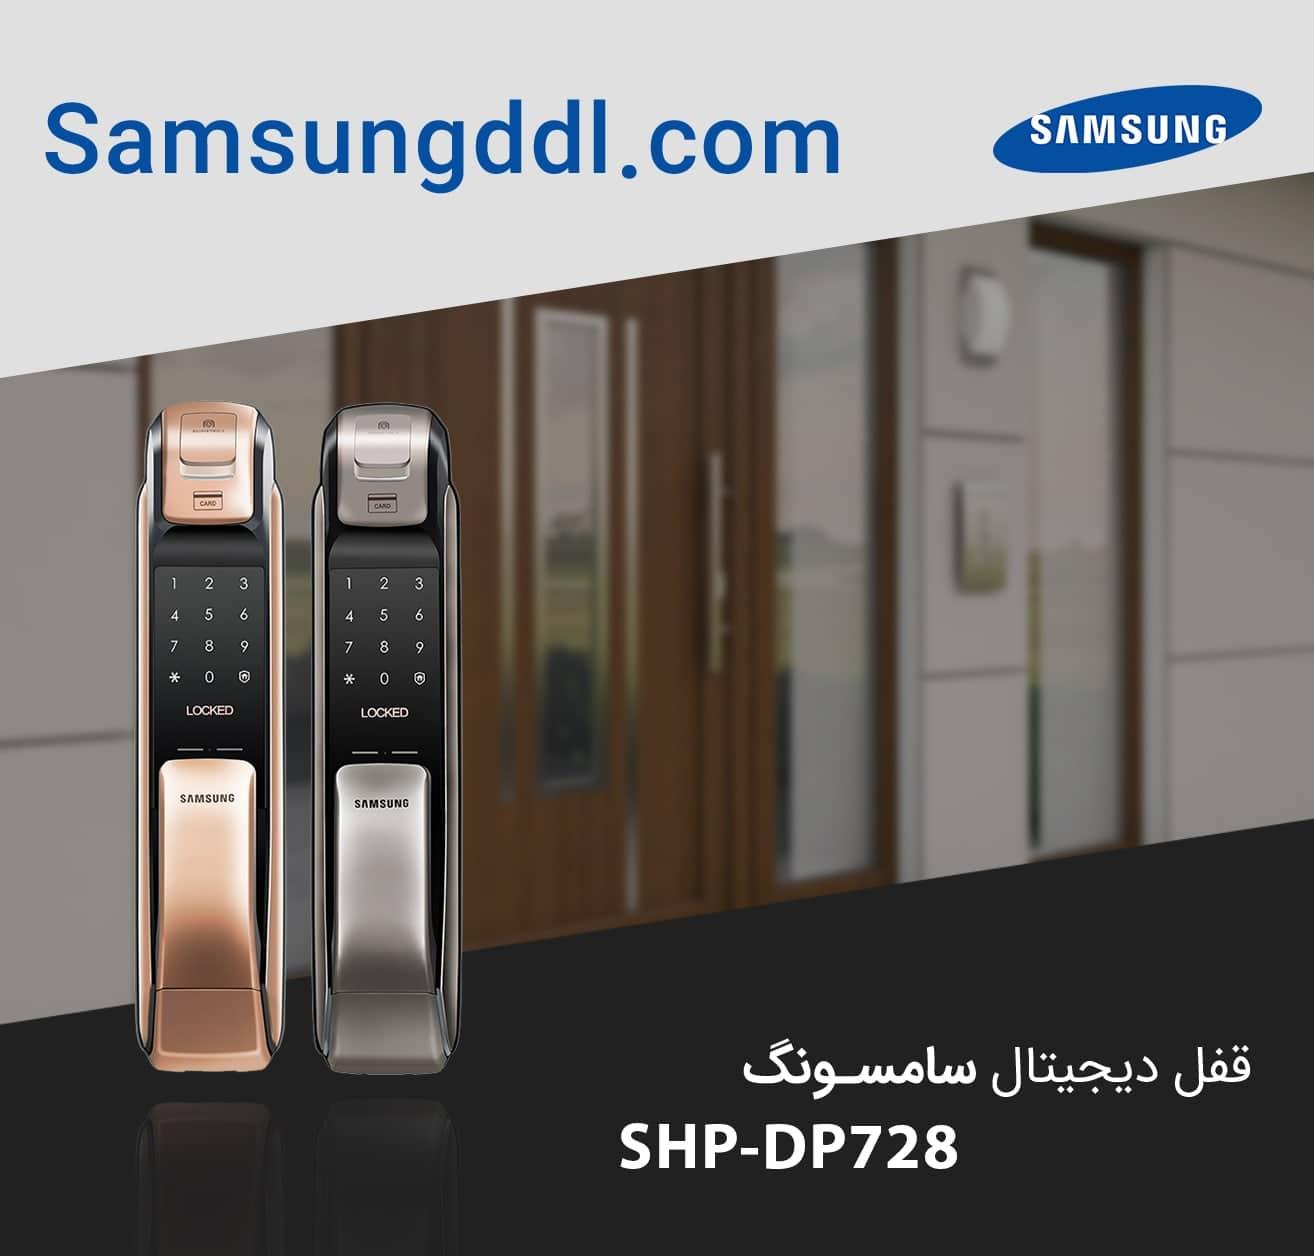 DP728-samsung